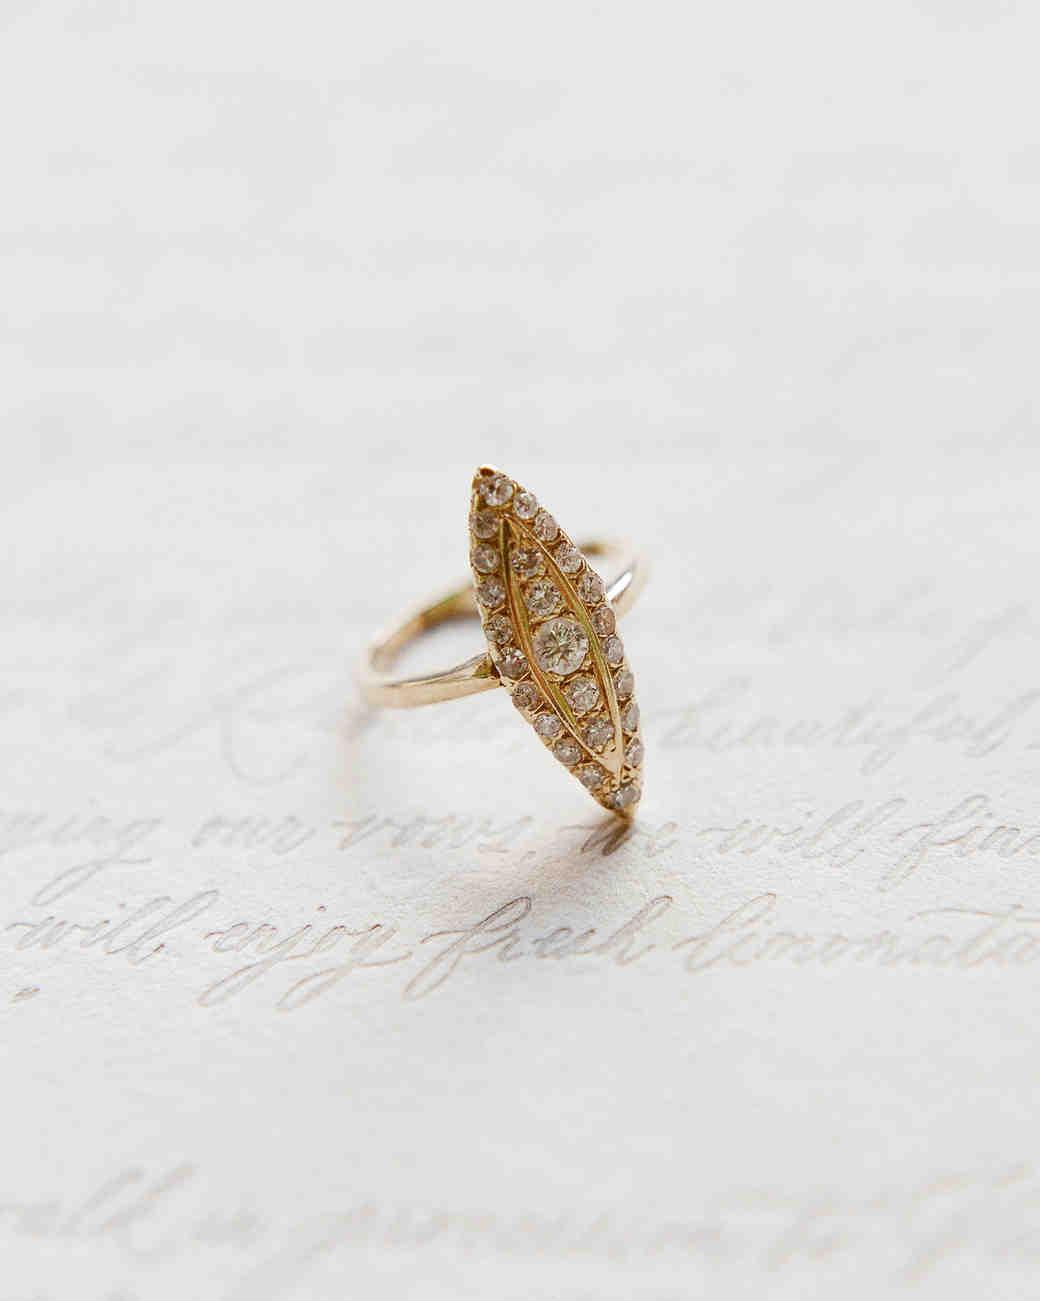 lisa greg italy wedding ring